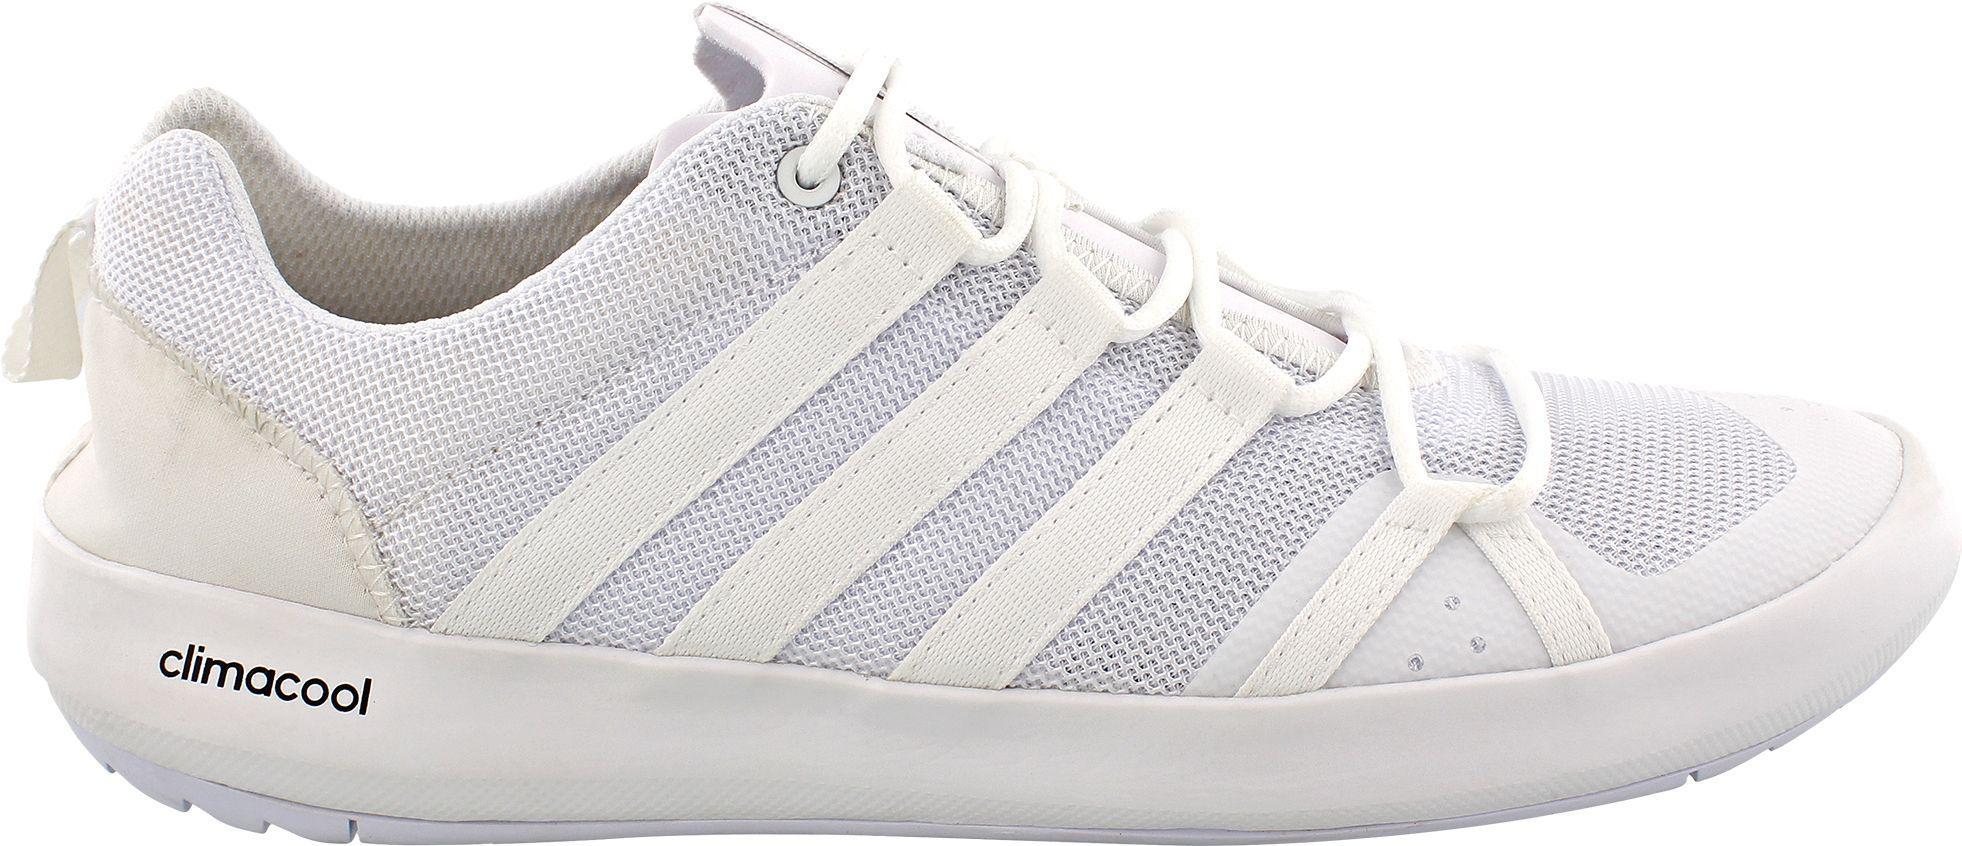 adidas Outdoor Terrex Climacool Boat Sleek Water Shoes in